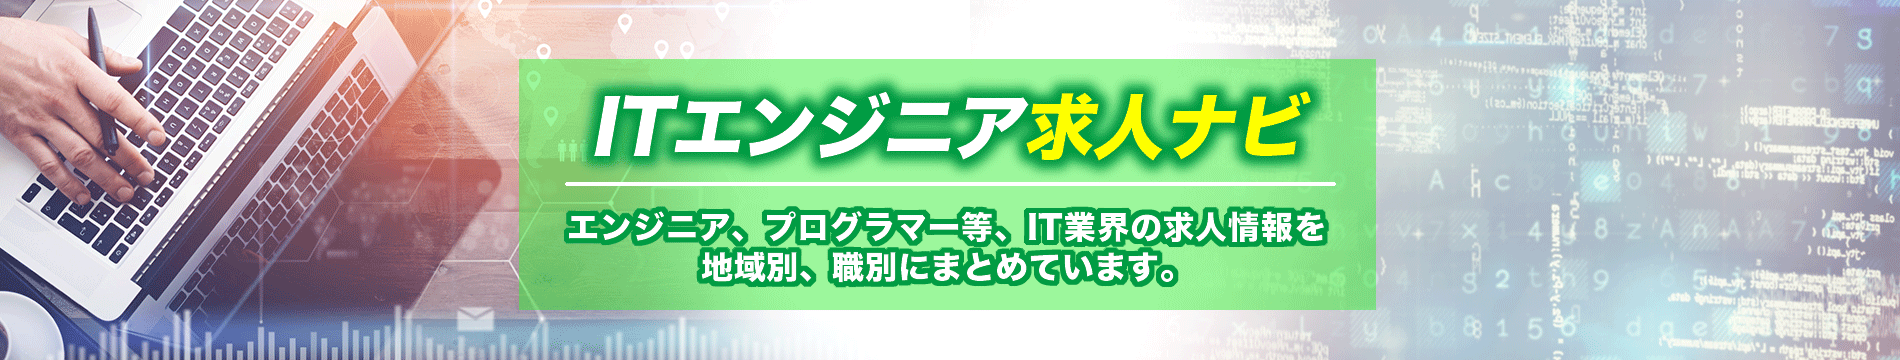 ITエンジニア求人ナビ〜転職情報〜